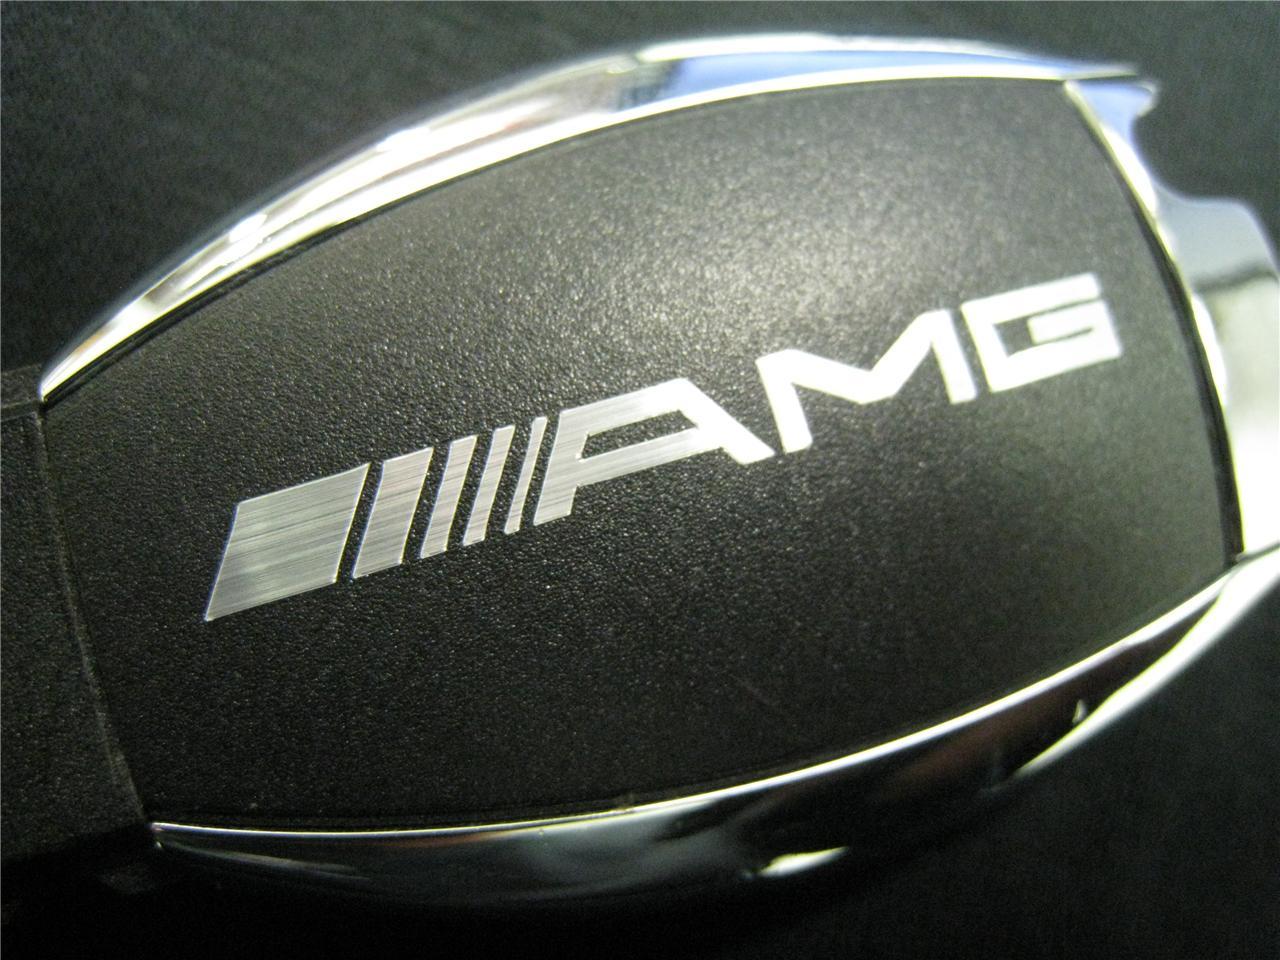 Mercedes Benz Amg Decals